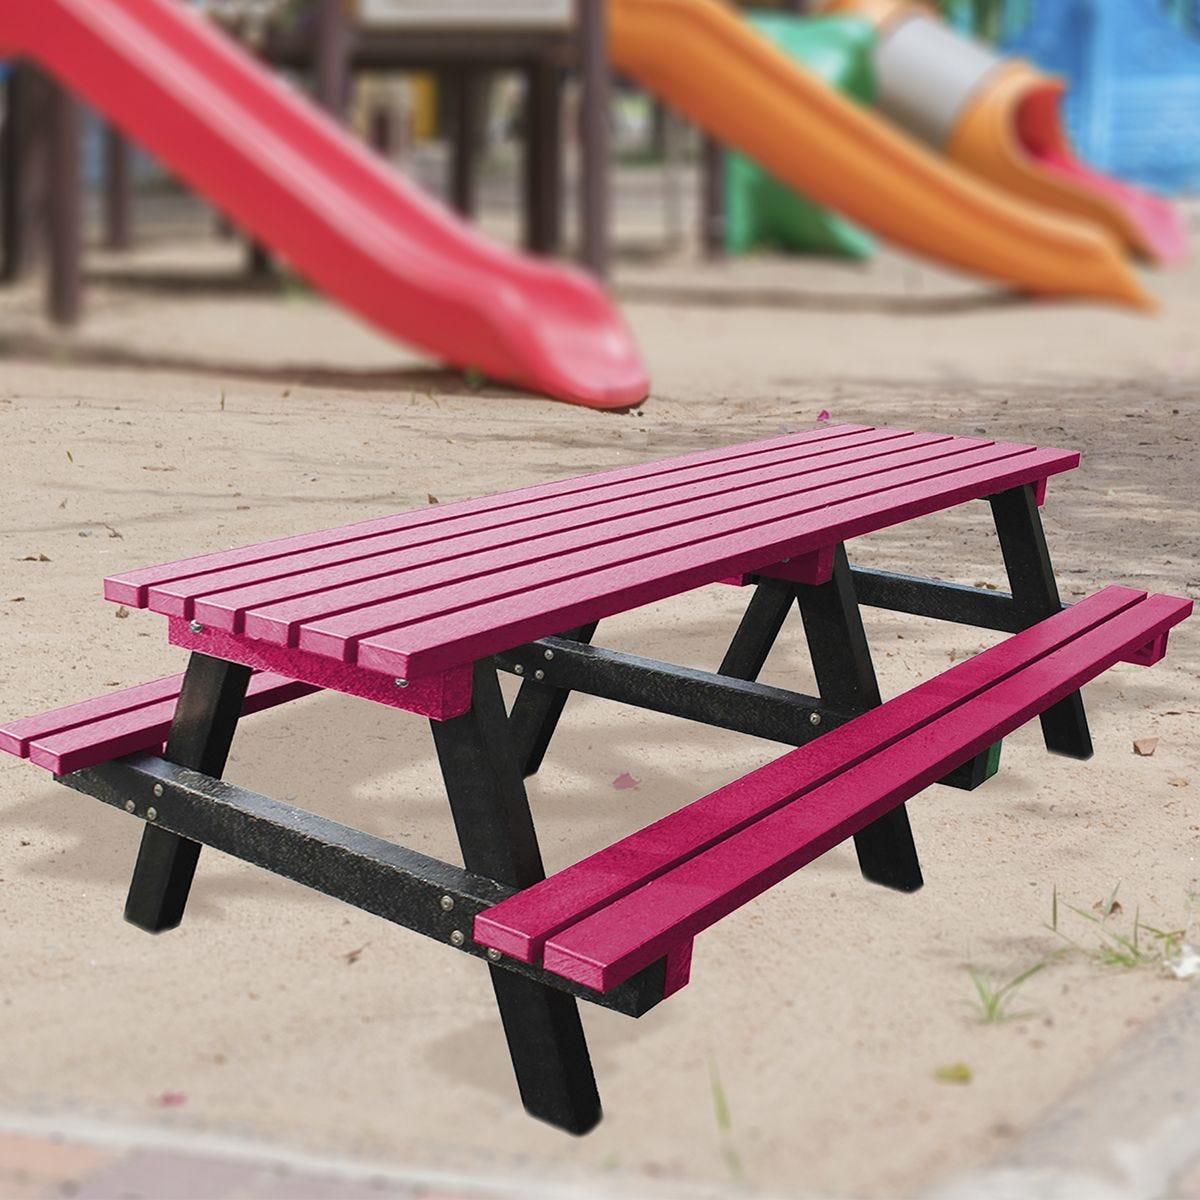 NBB Junior Medium 150cm Recycled Plastic Picnic Table - Cranberry Red